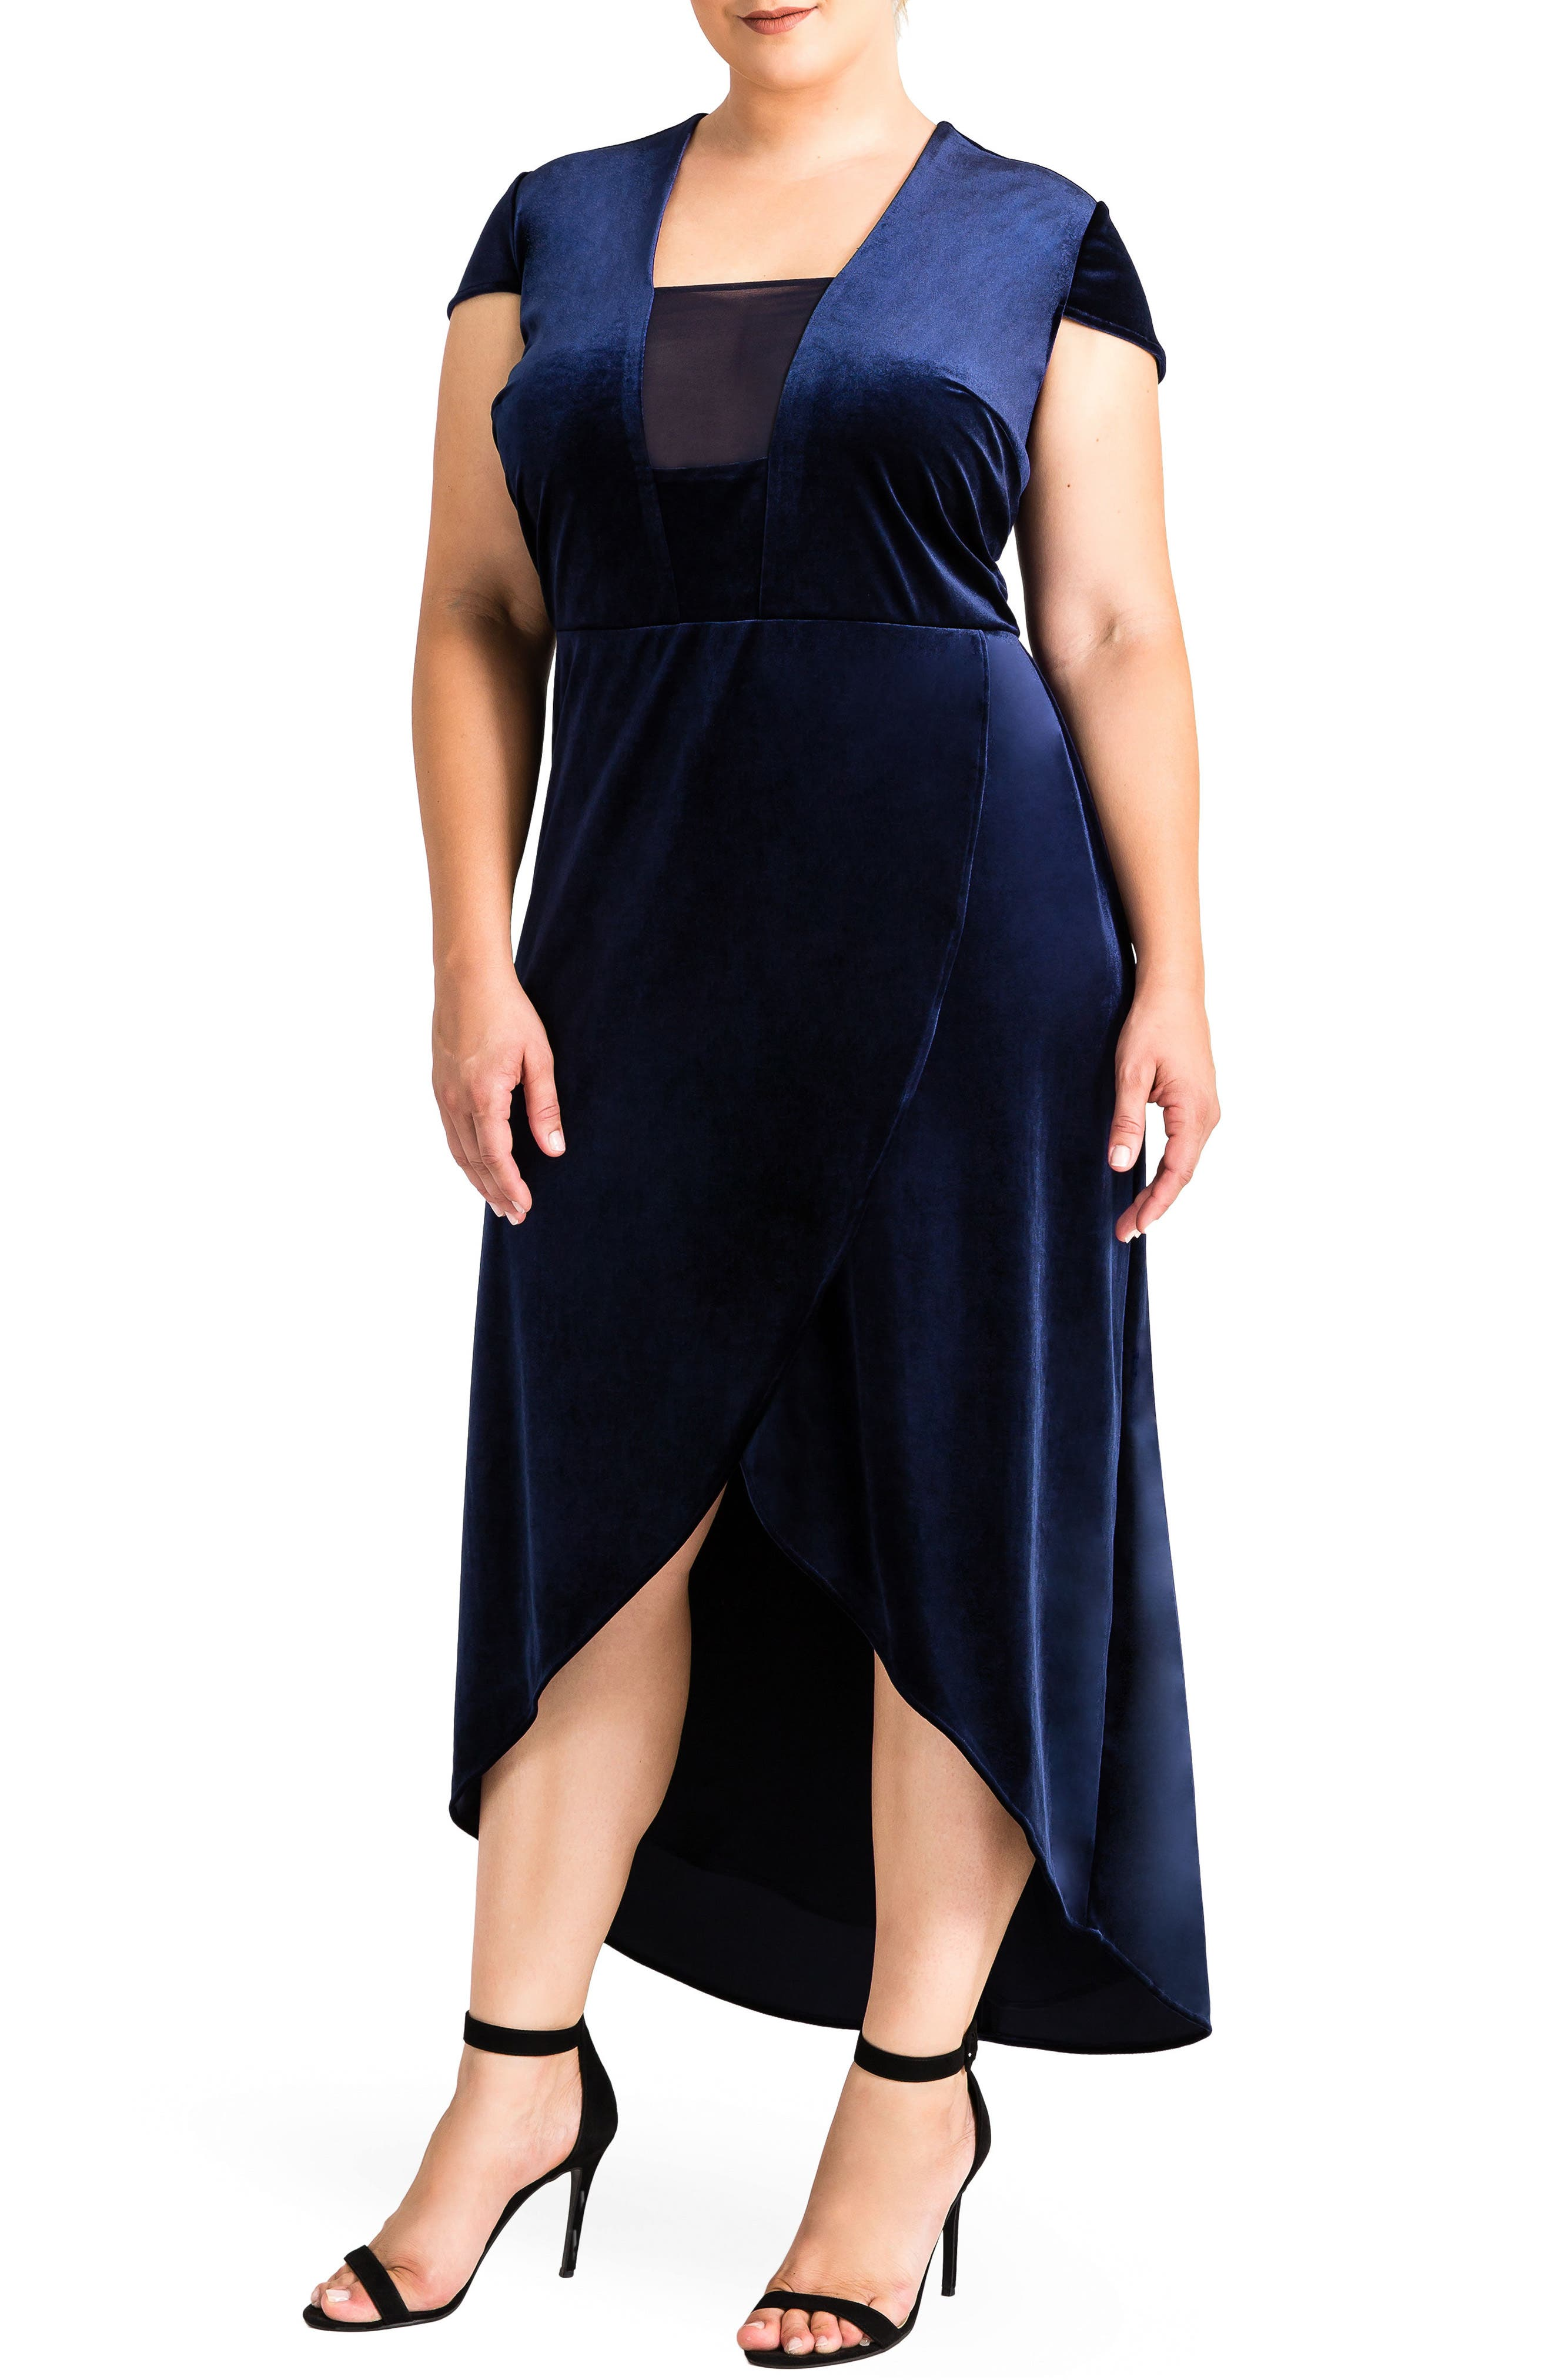 Luna Velvet Dress,                             Main thumbnail 1, color,                             Midnight Blue